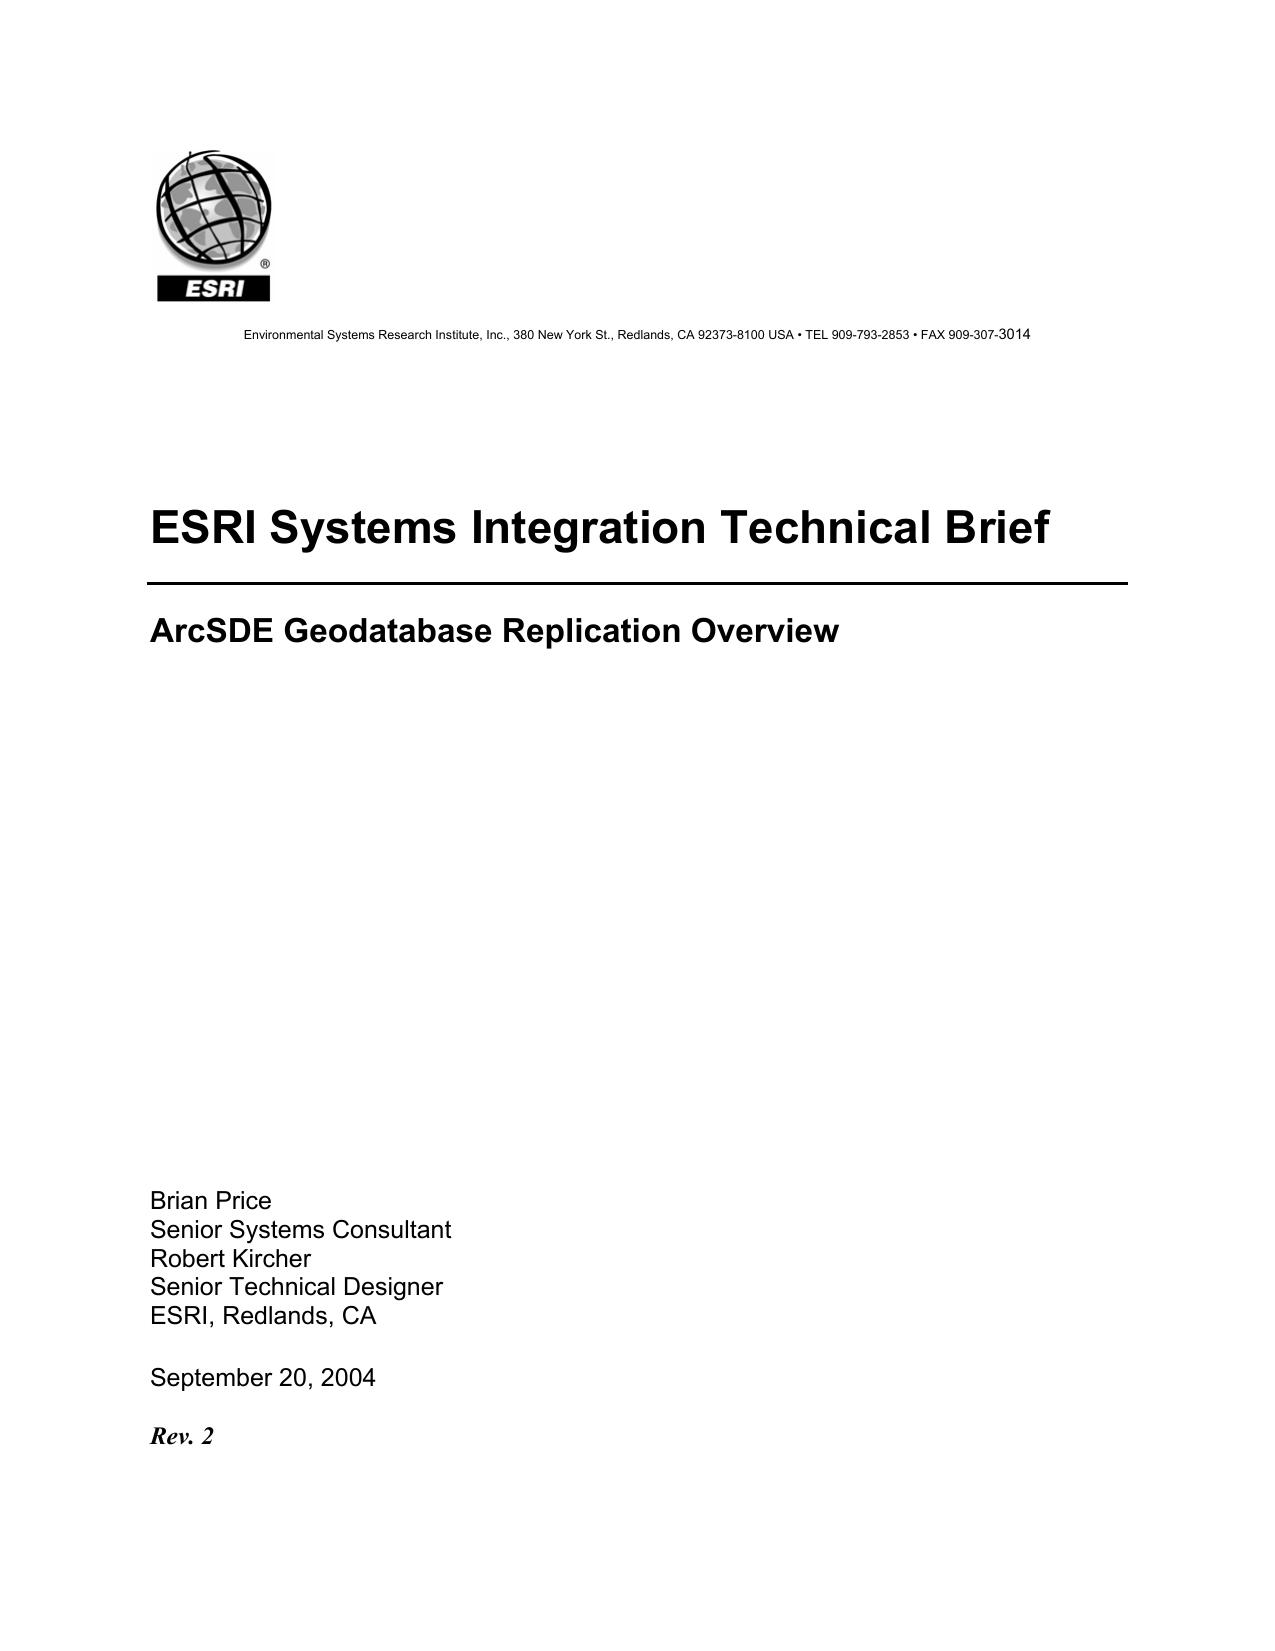 ArcSDE Geodatabase Replication Overview | manualzz com